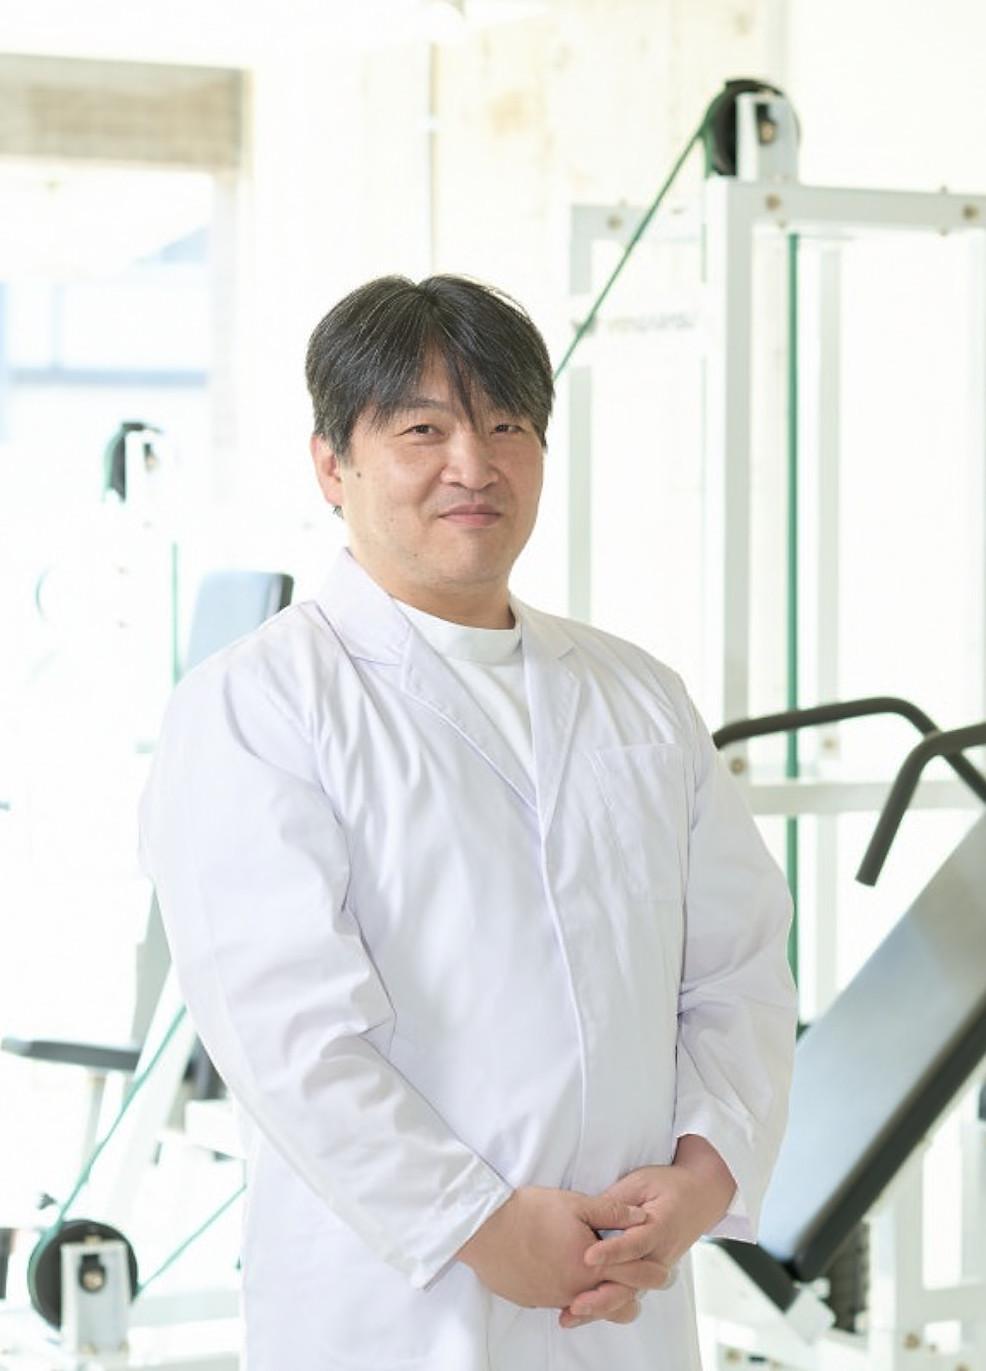 YATAGARASUの考案者、筋肉ドクター小島央の画像